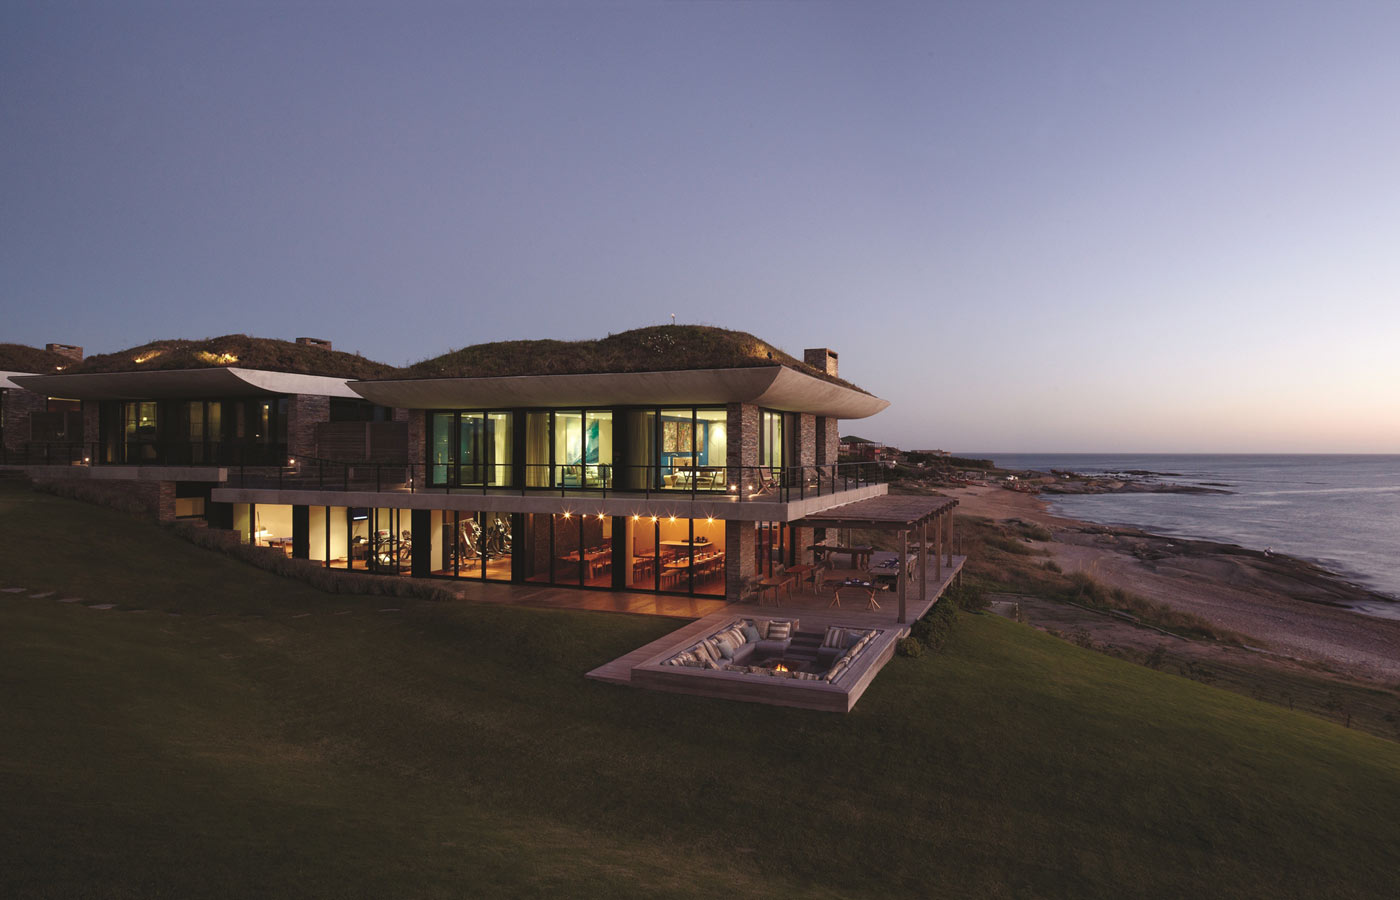 The main building of Playa Vik, Uruguay